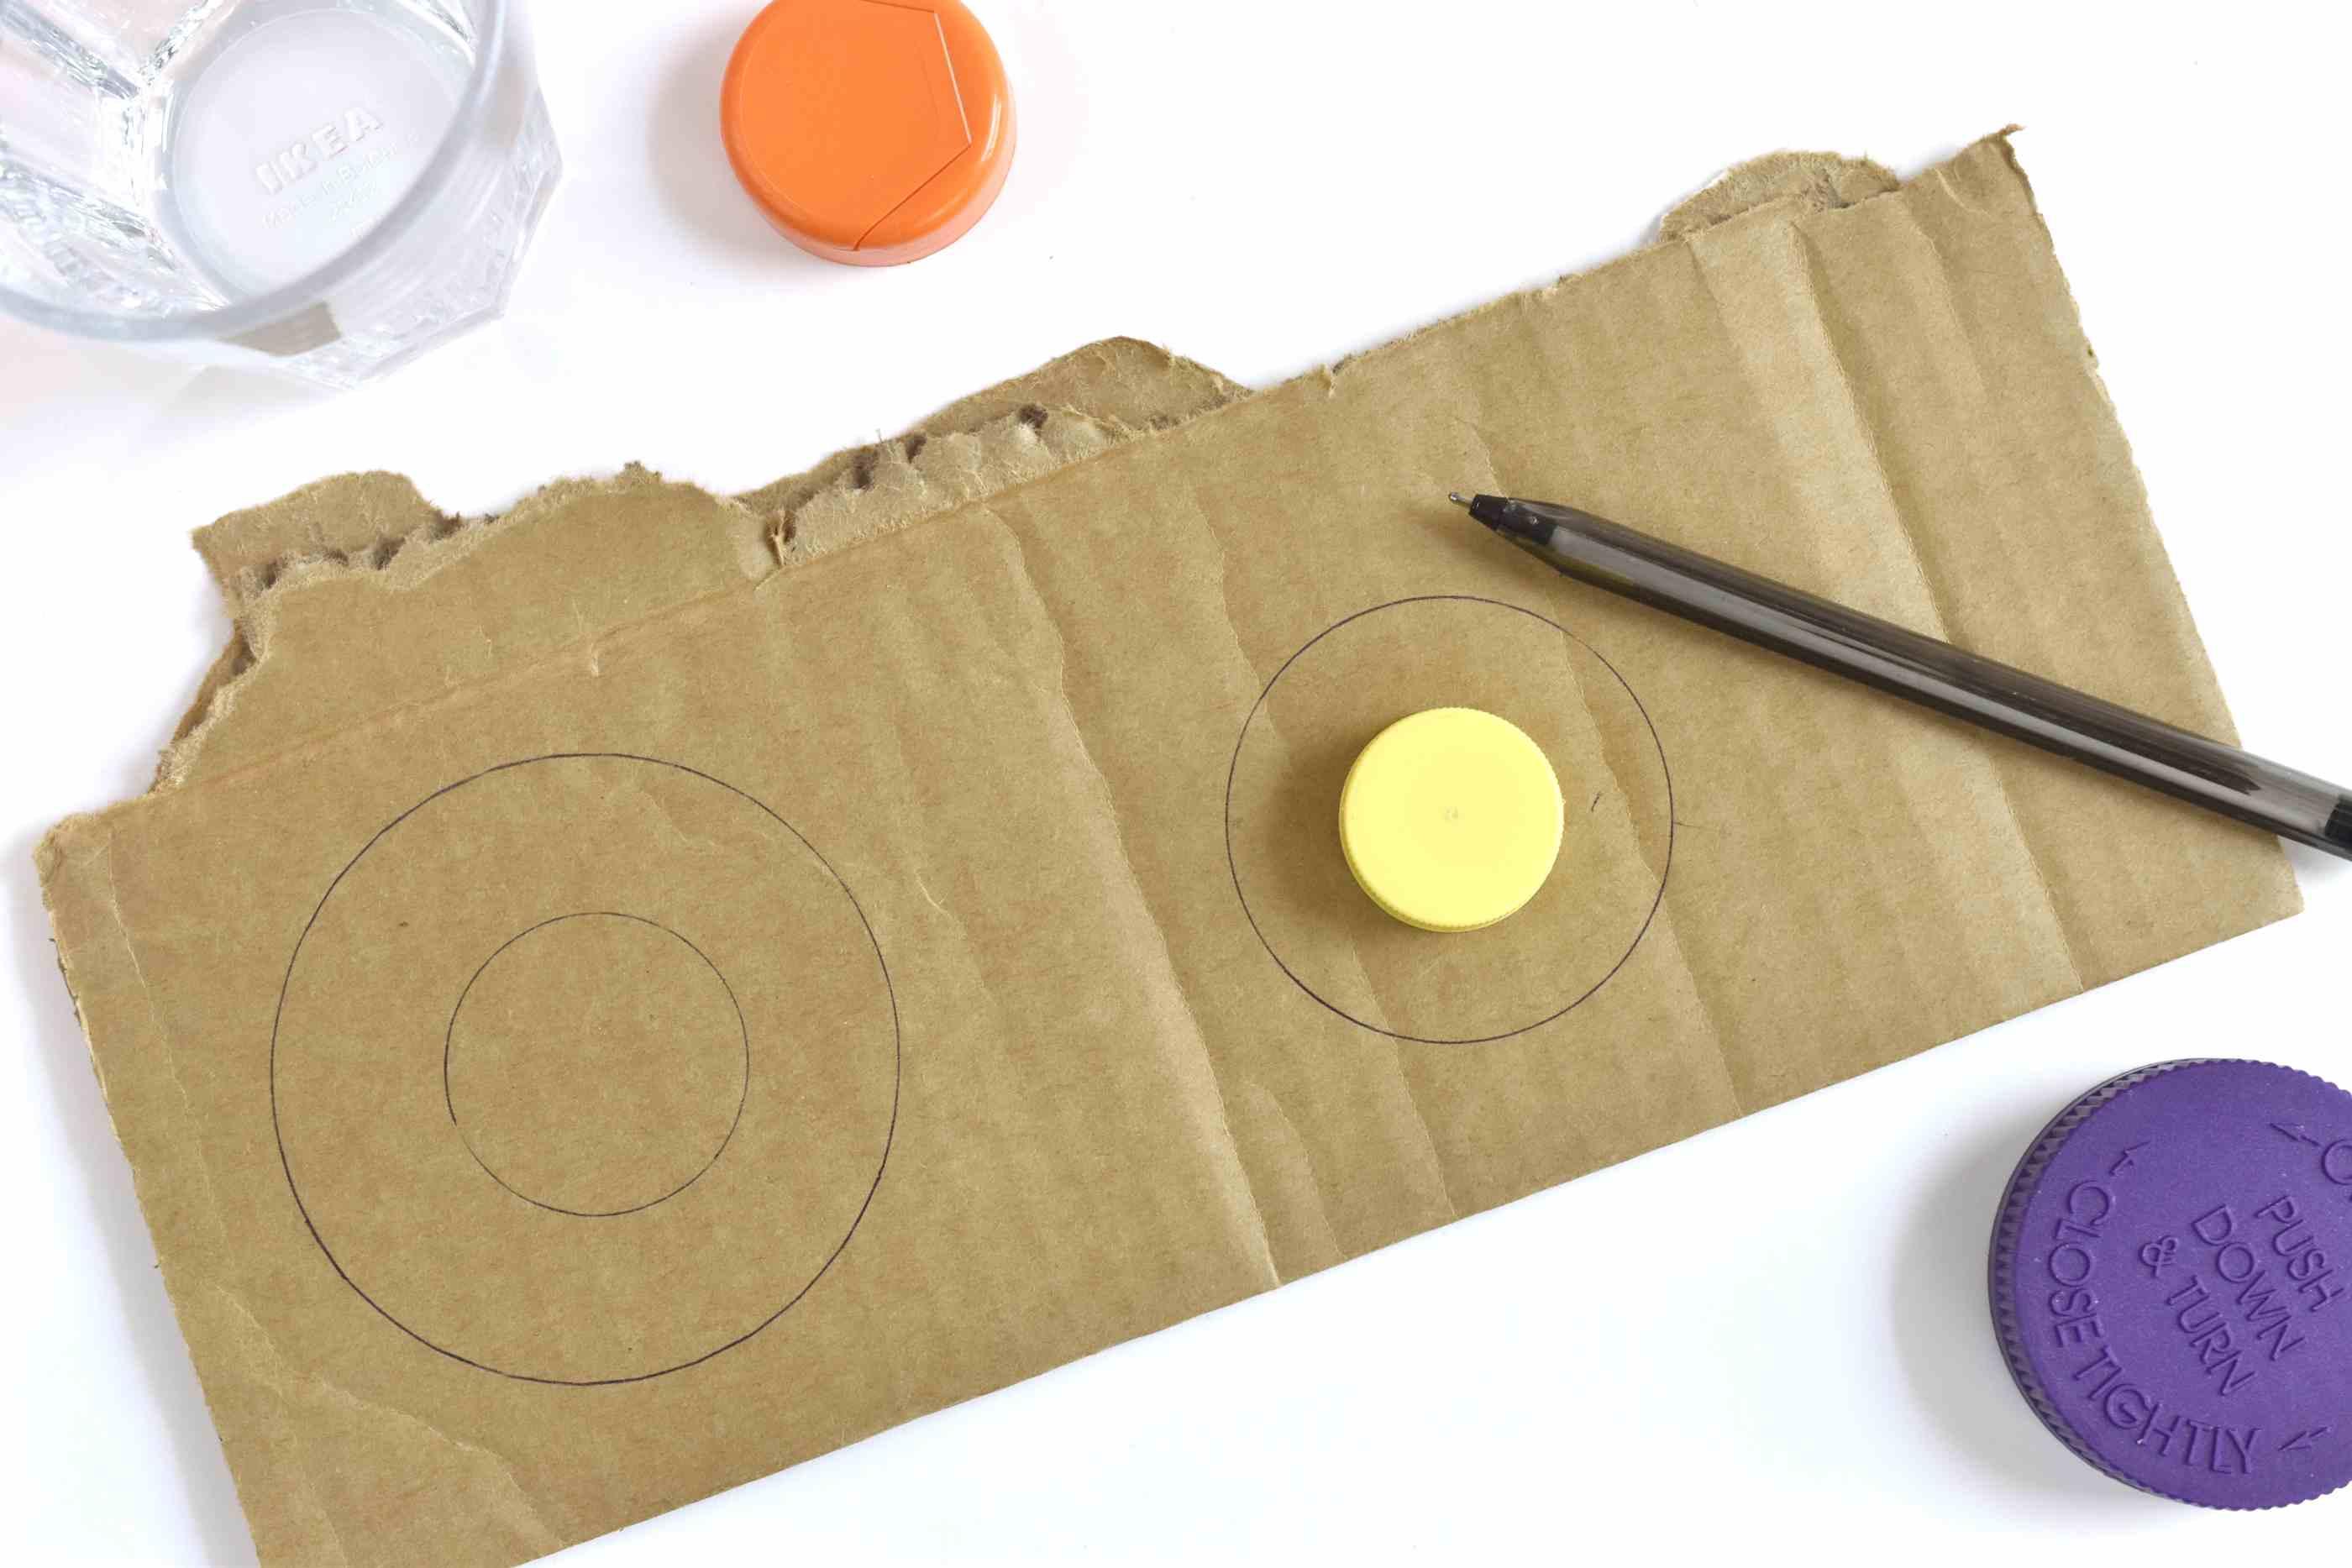 Make Cardboard Templates